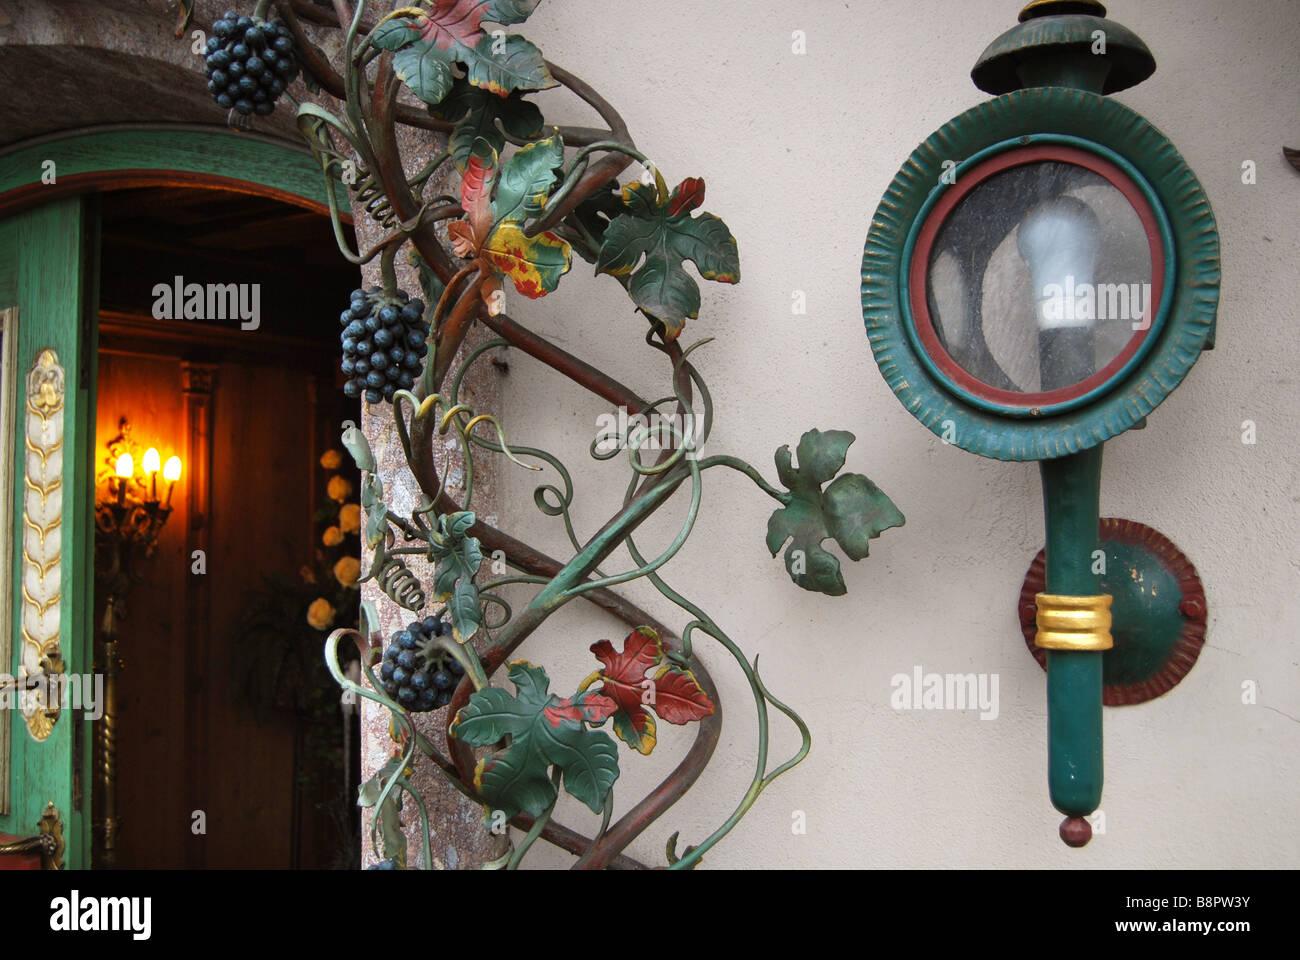 Gasthof Neue Post family restaurant Mayrhofen Tyrol Austria - Stock Image